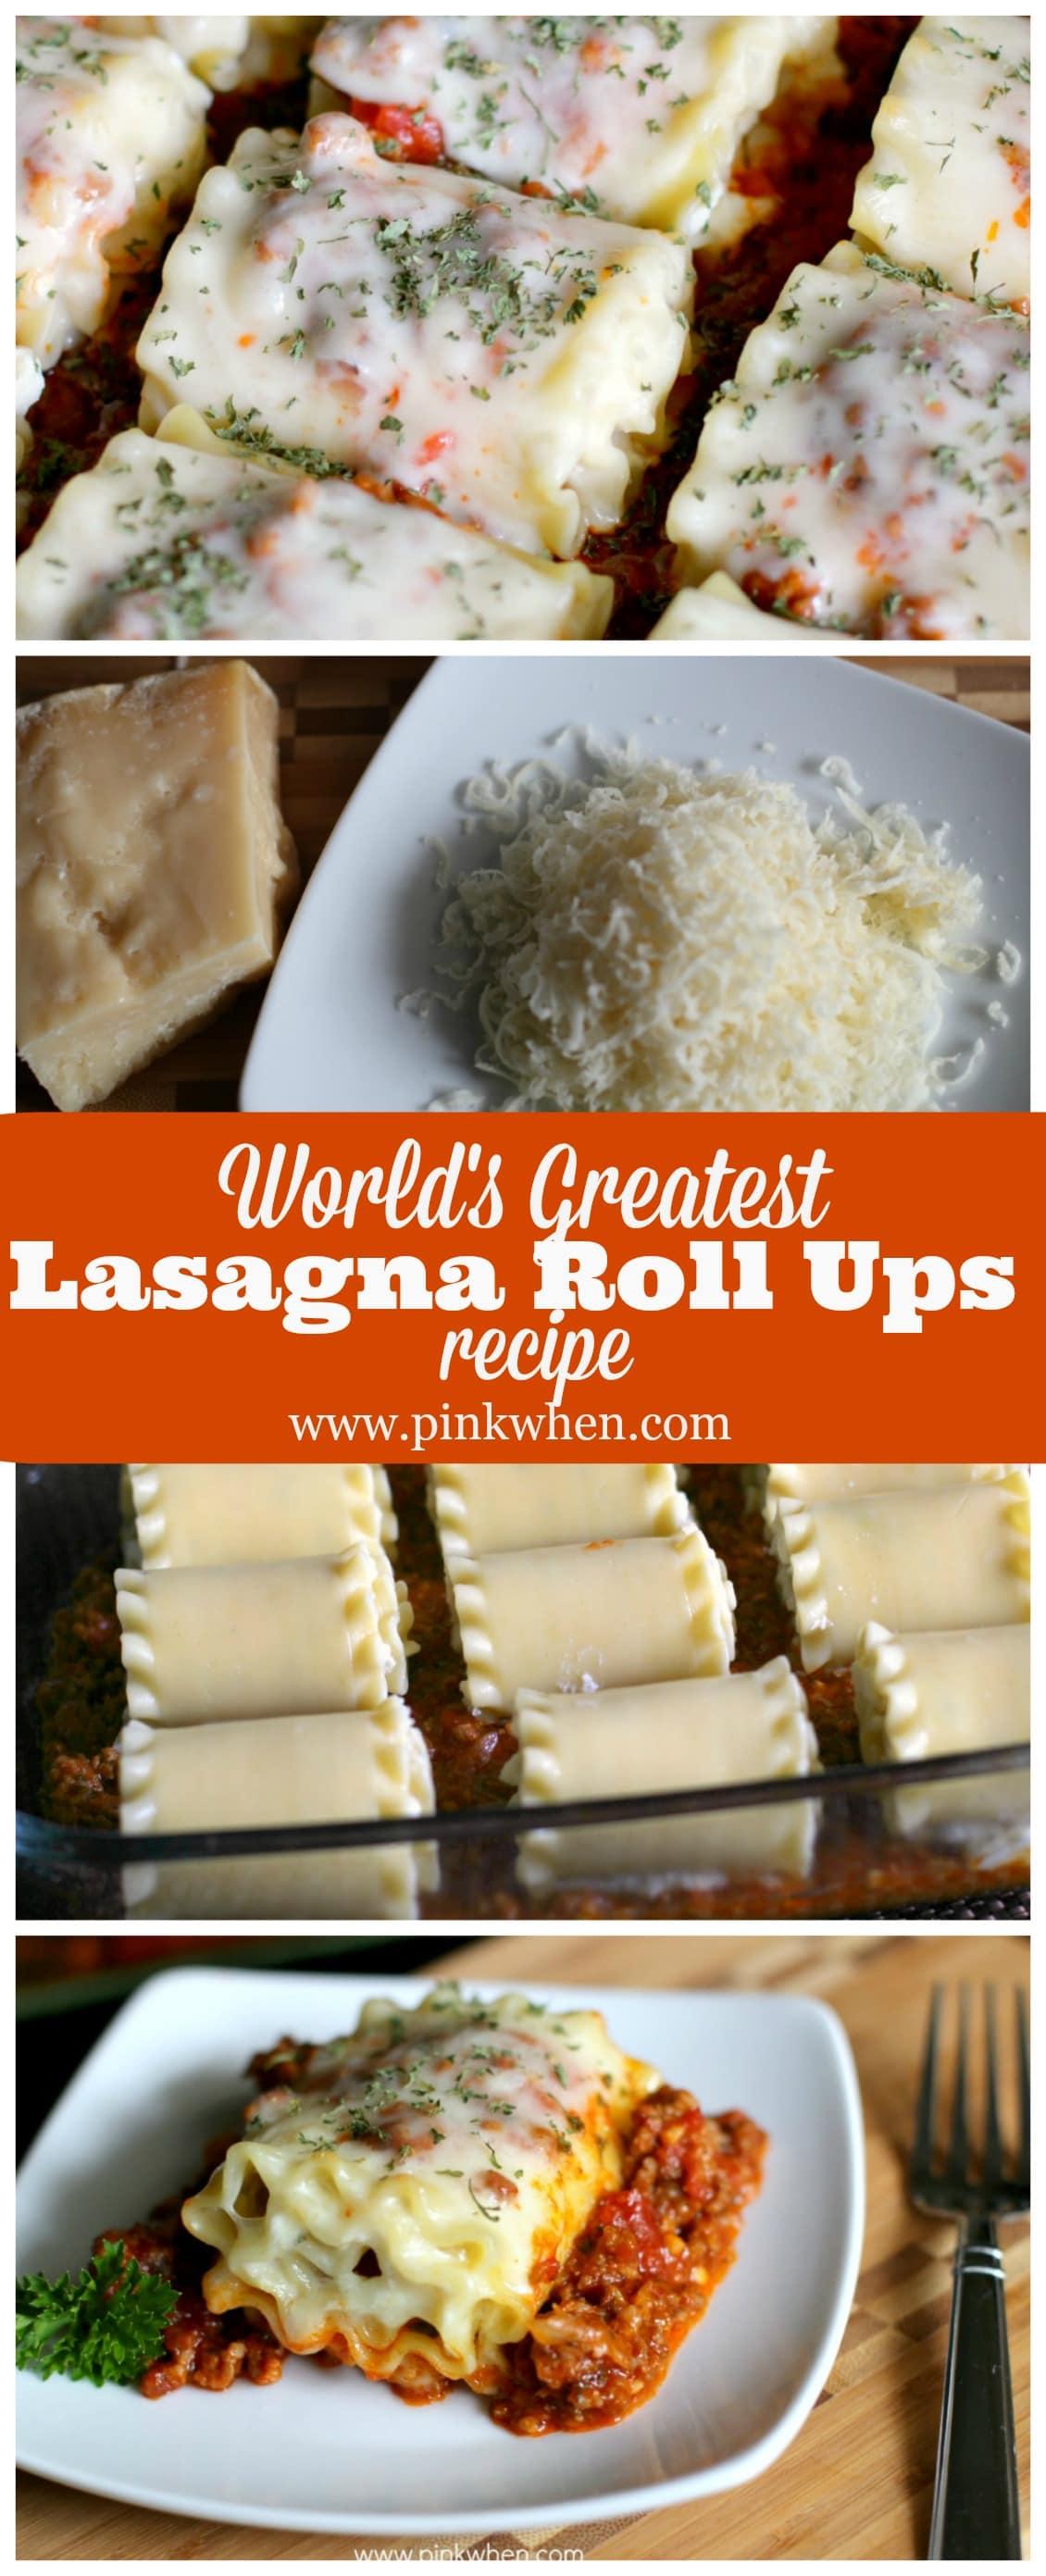 World's Greatest Lasagna Roll Ups Recipe @pinkwhen